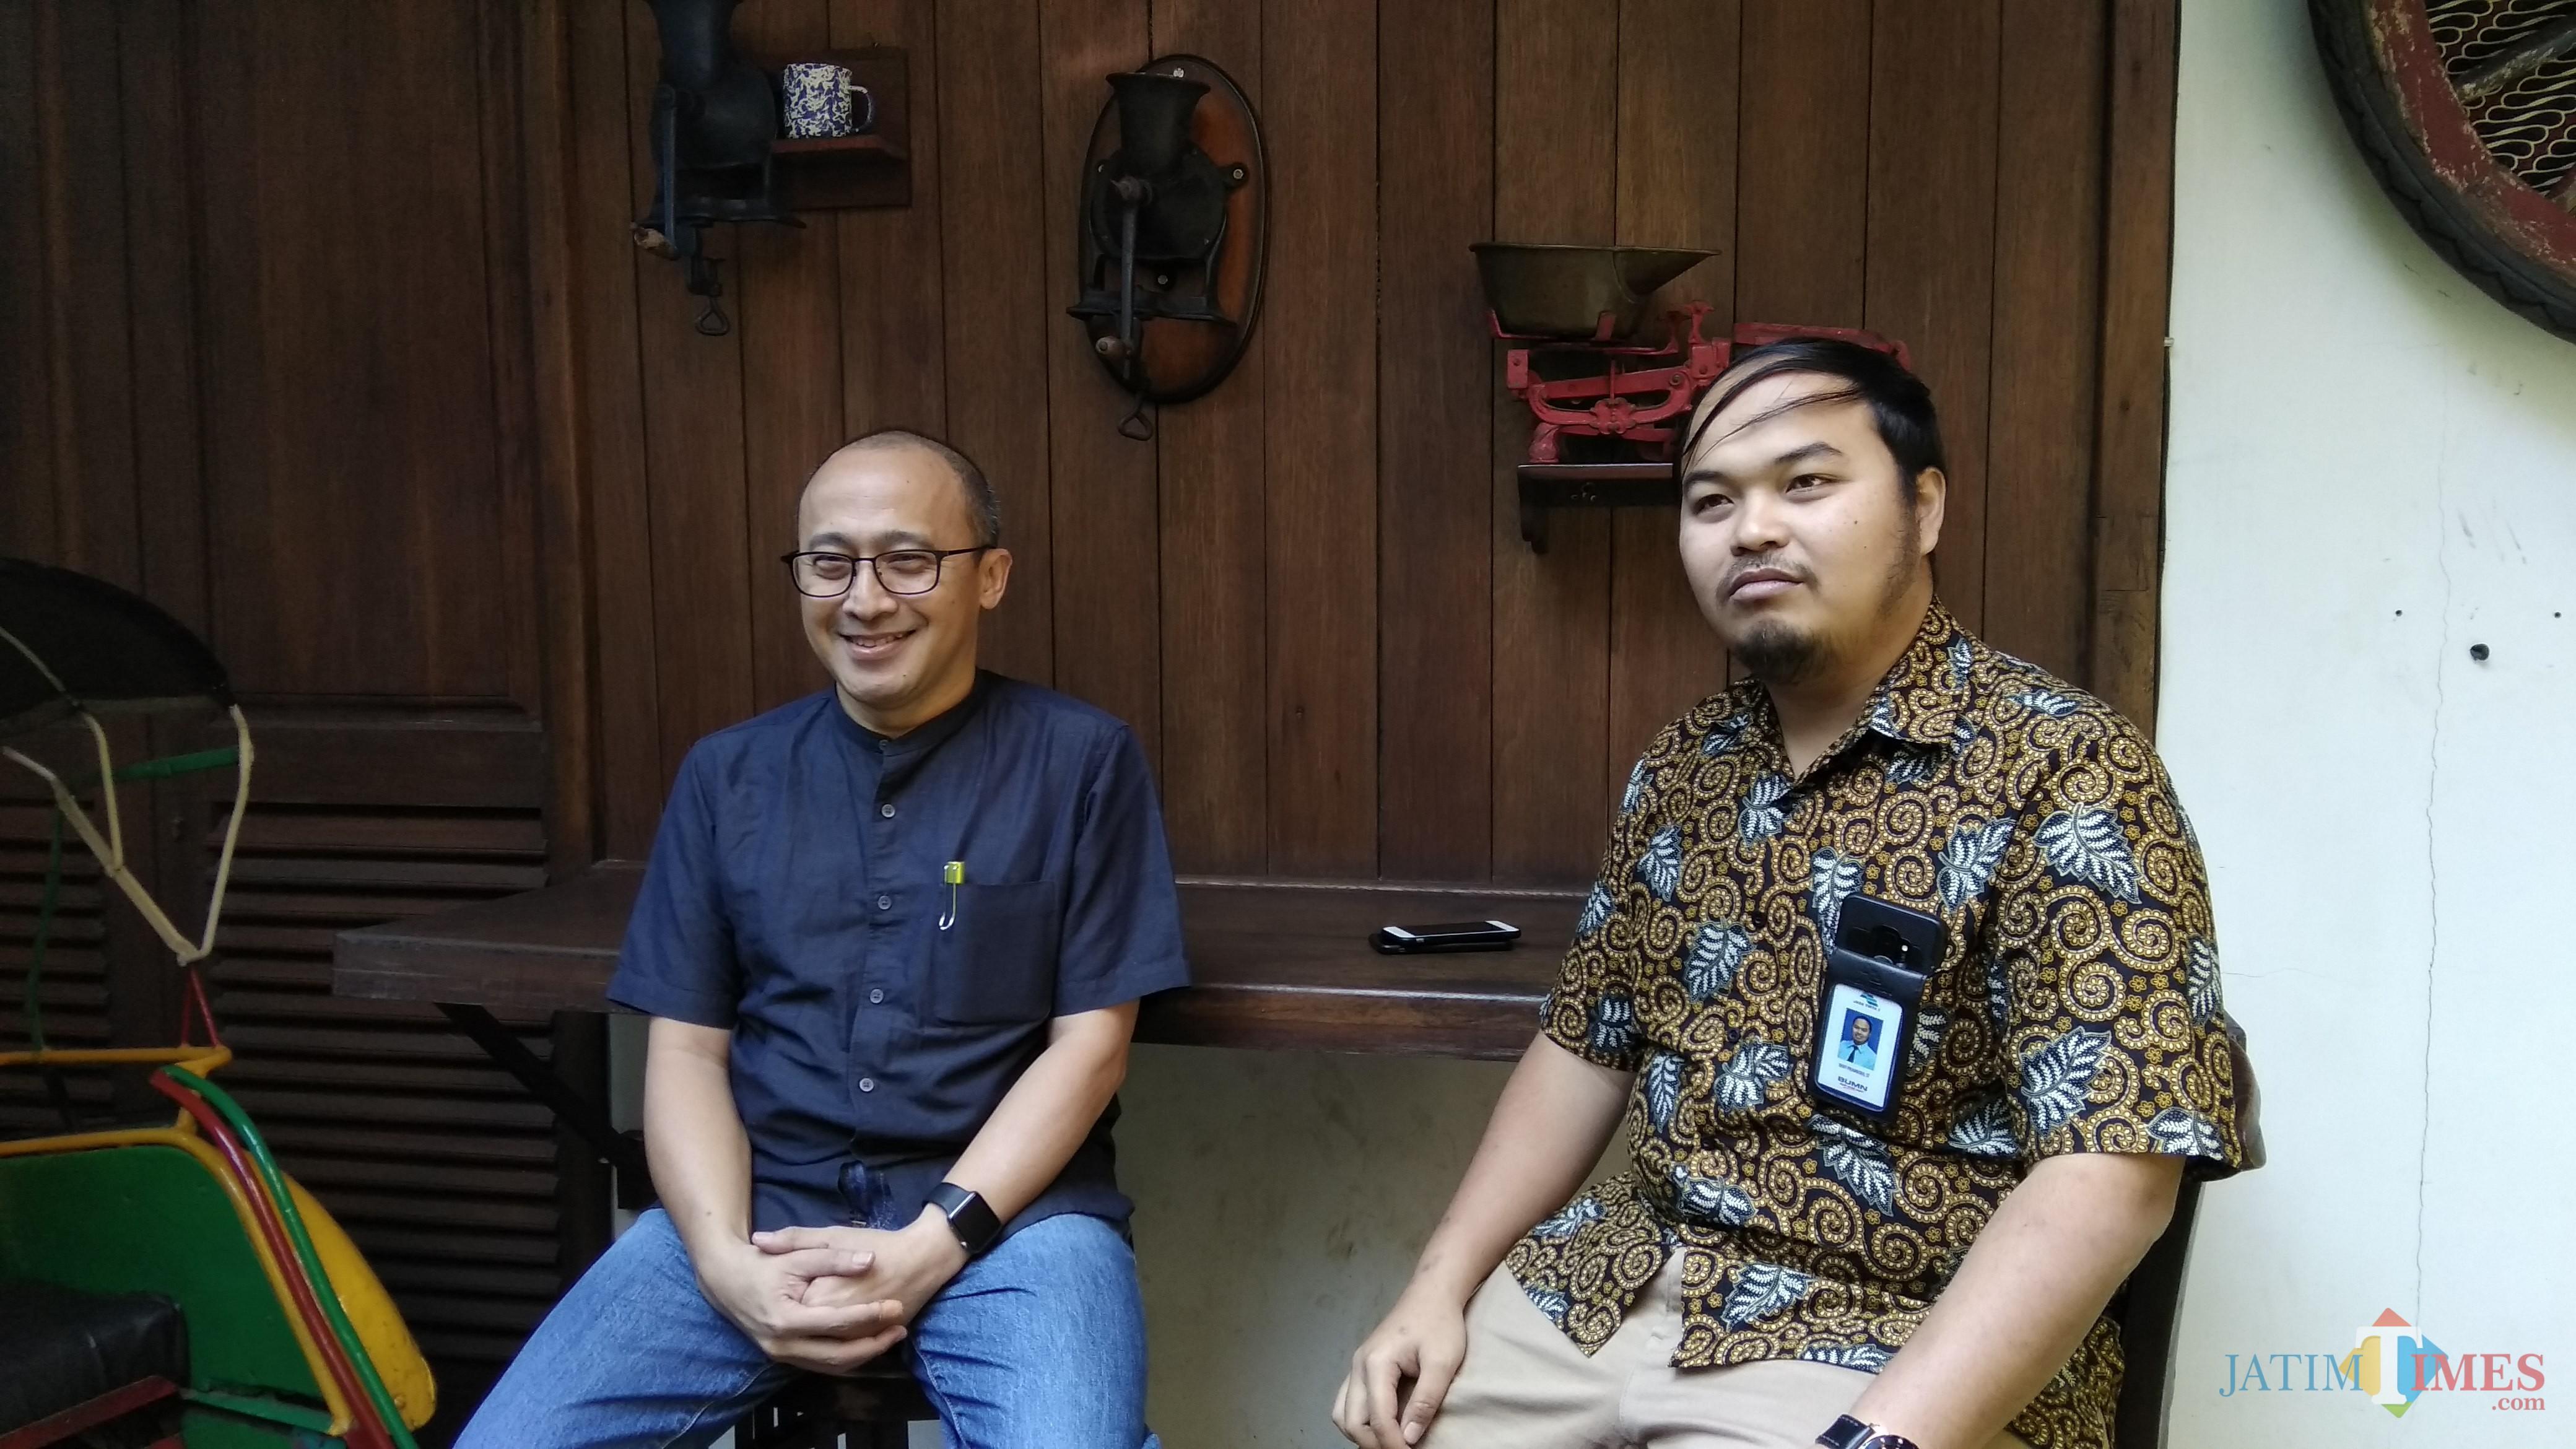 Direktur Utama PJT I Raymond Valiant Ruritan (kiri) saat menemui awak media di Malang. (Foto: Nurlayla Ratri/MalangTIMES)